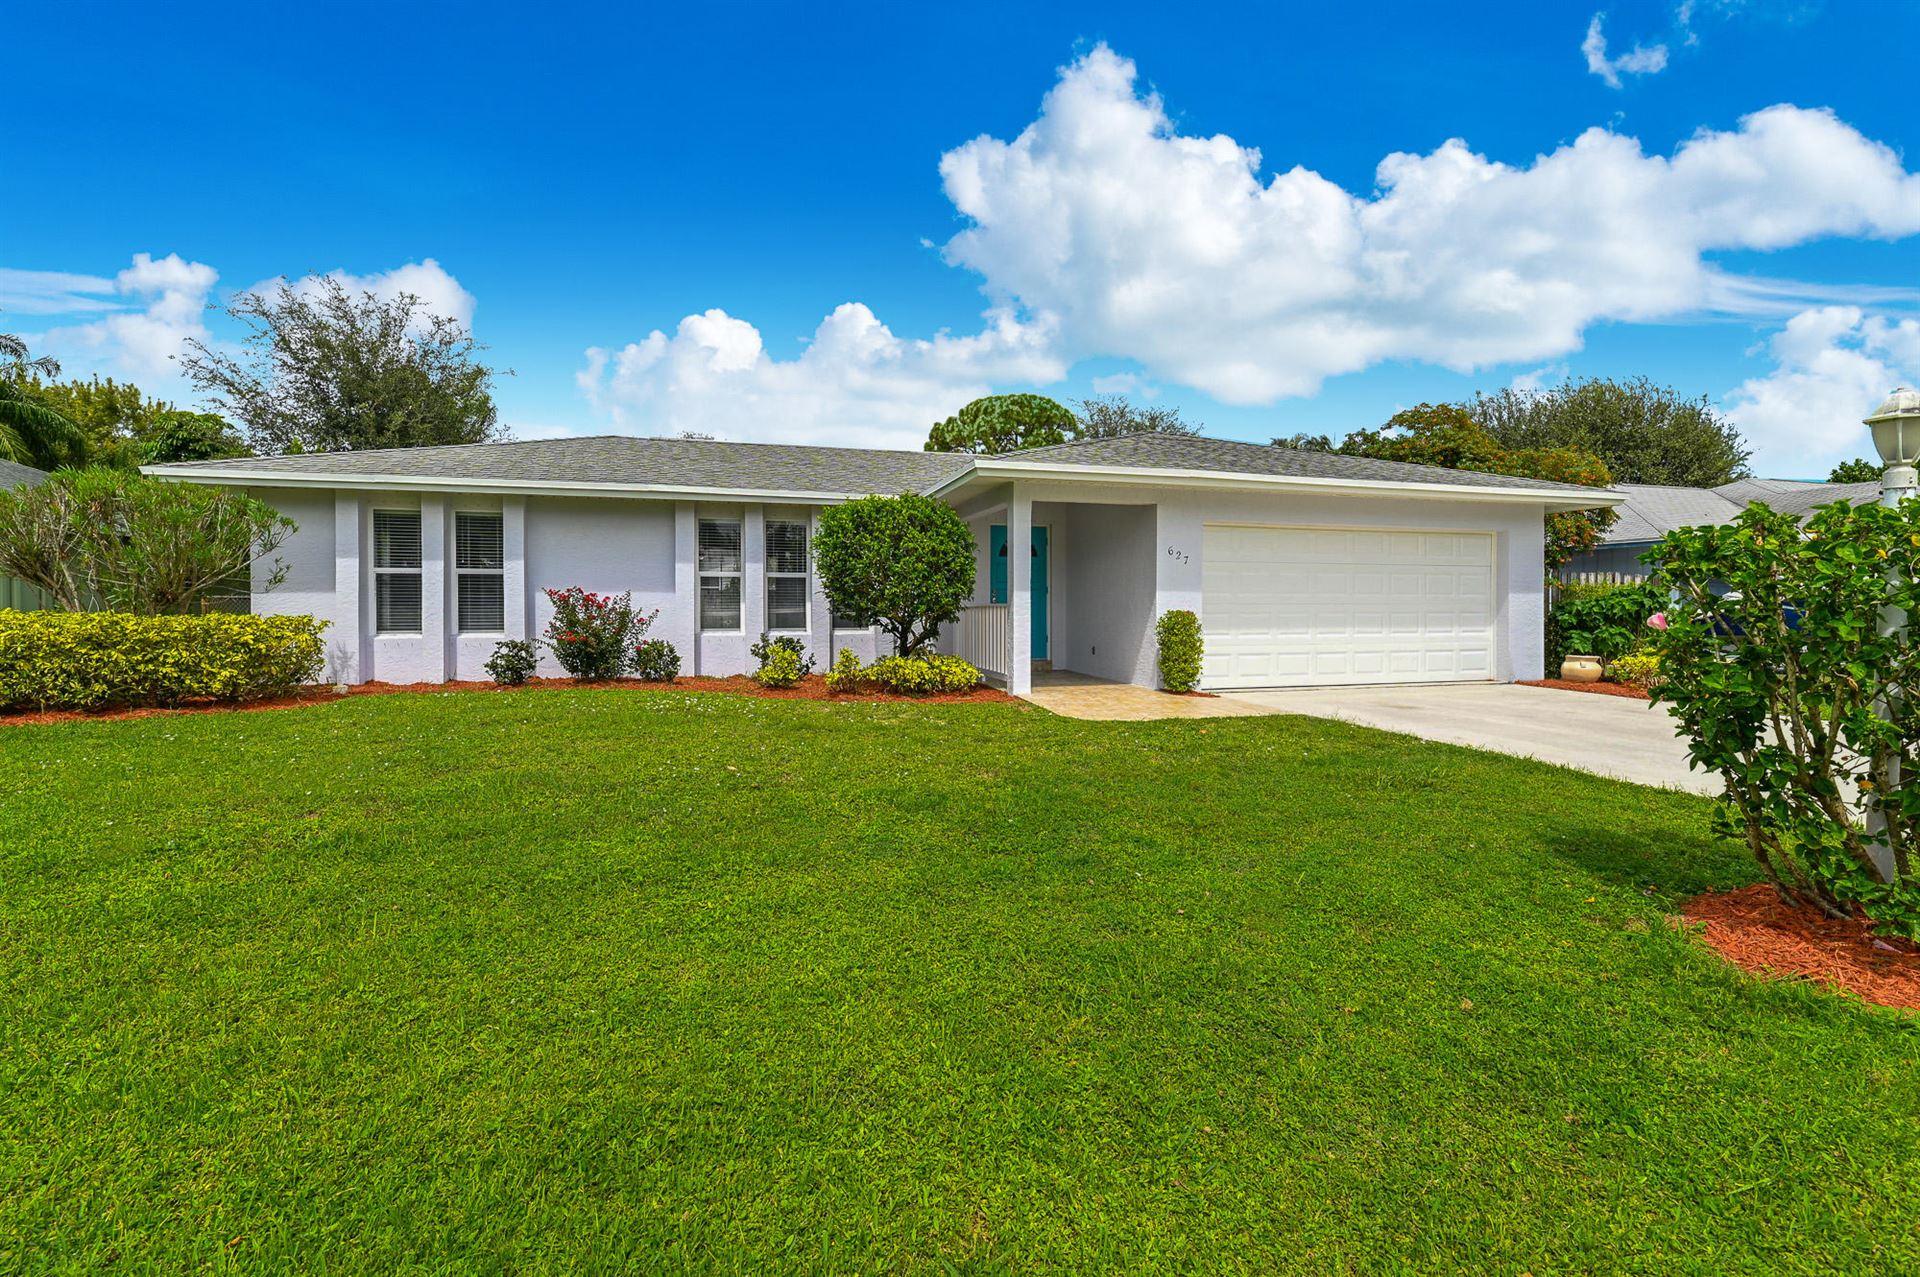 627 NE Maranta Terrado, Jensen Beach, FL 34957 - #: RX-10657274